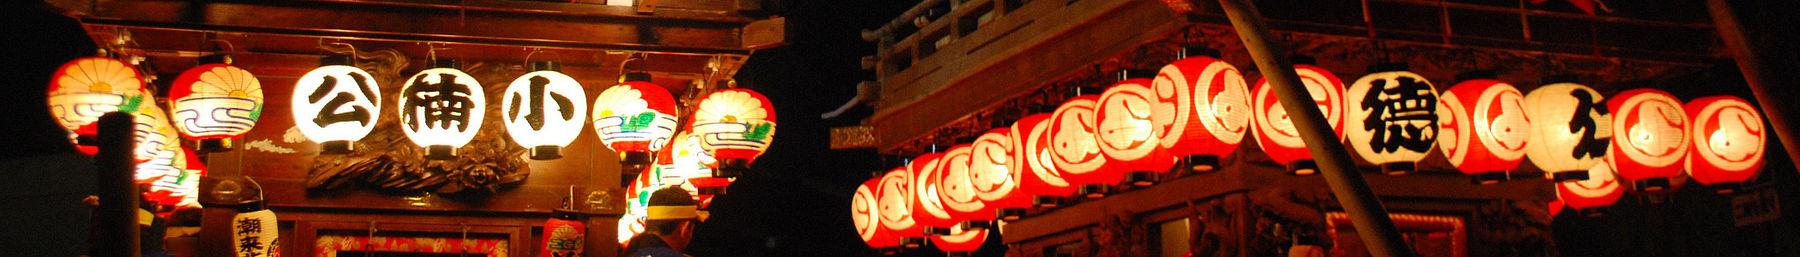 Chiba banner.jpg